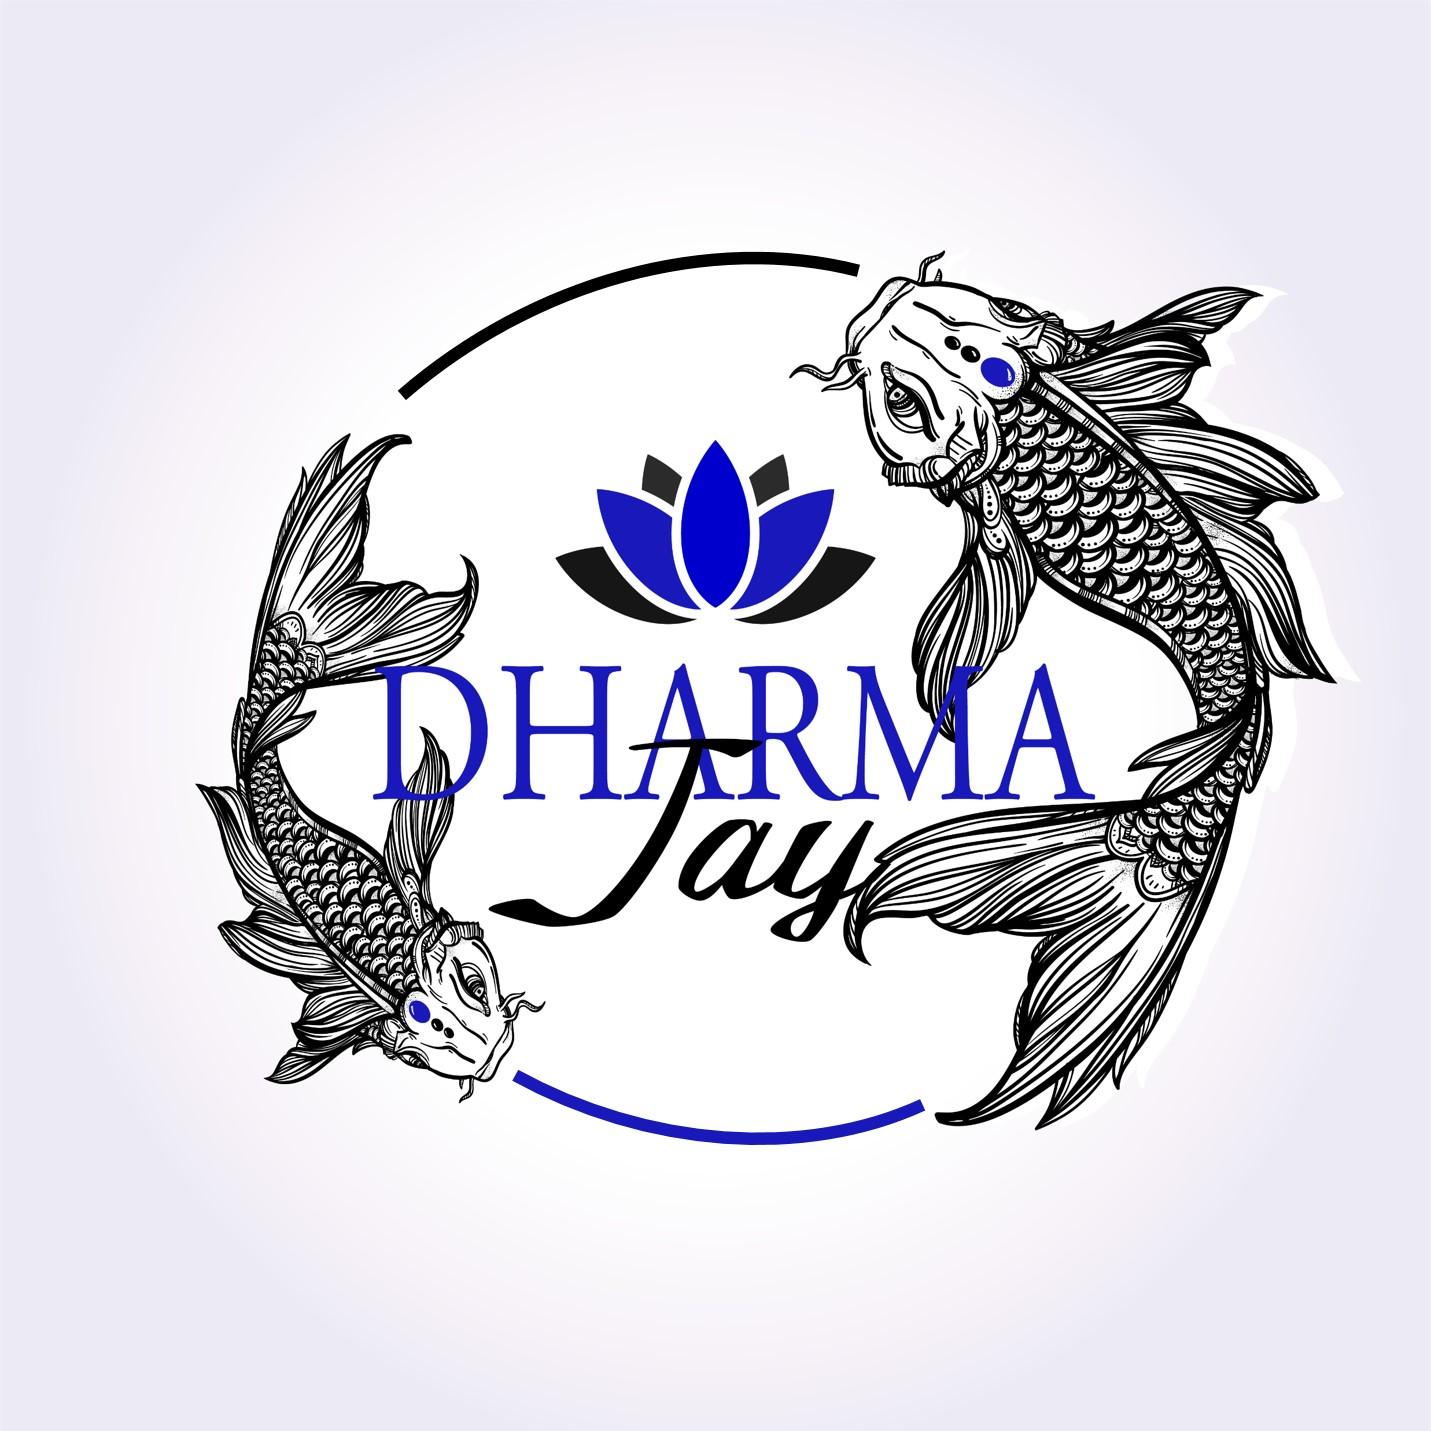 DHARMA JAY FINAL LOGO.jpg